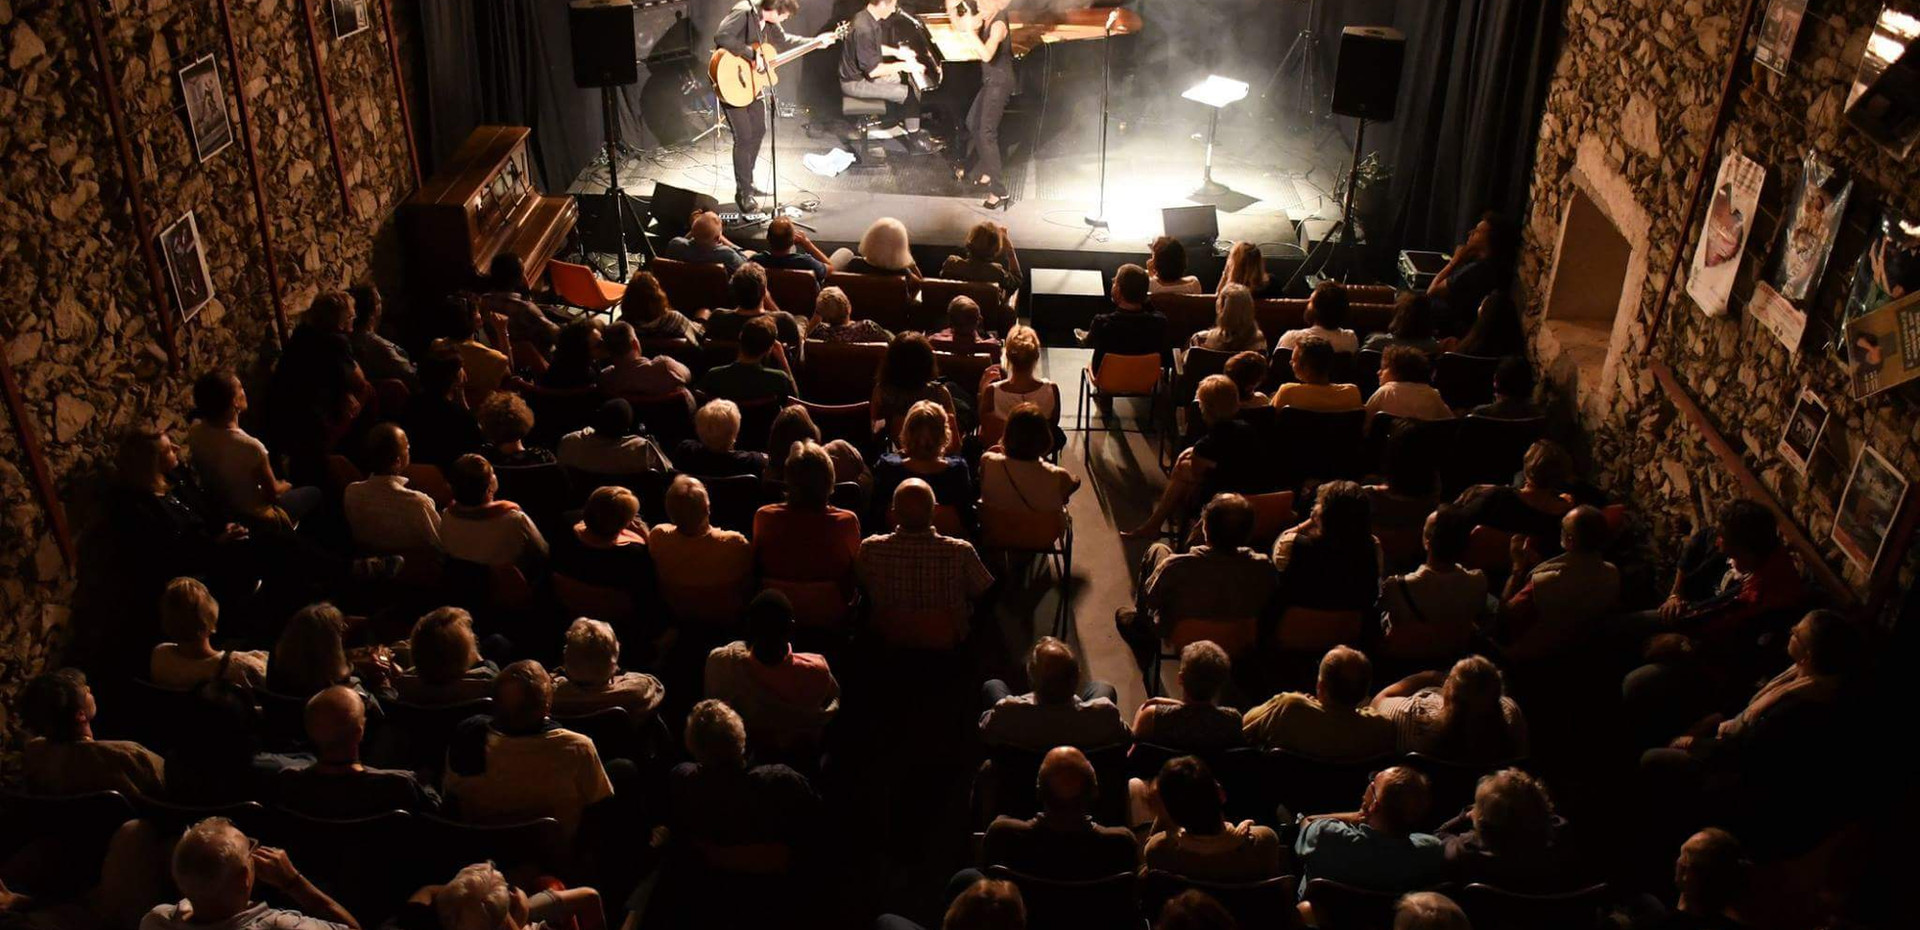 Jazz Festival, La Garde. Sophie Thiam, David Henry, Richard Puaud,  © Jochen Strobel